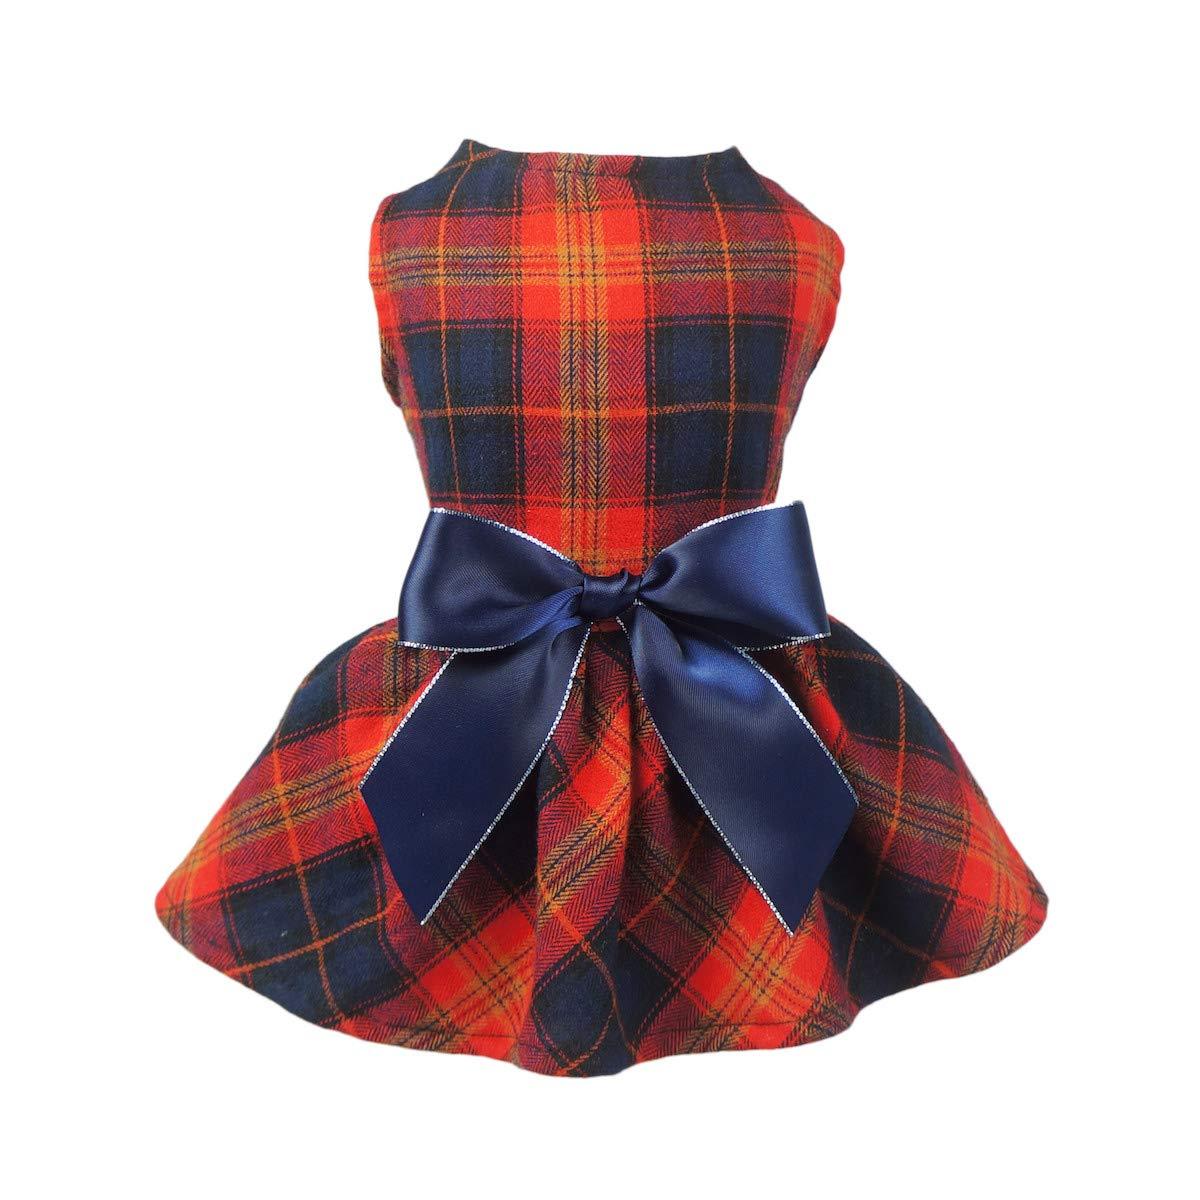 Fitwarm Pet Clothes for Dog Dresses Plaid Shirts Cat Apparel Cotton Red Medium